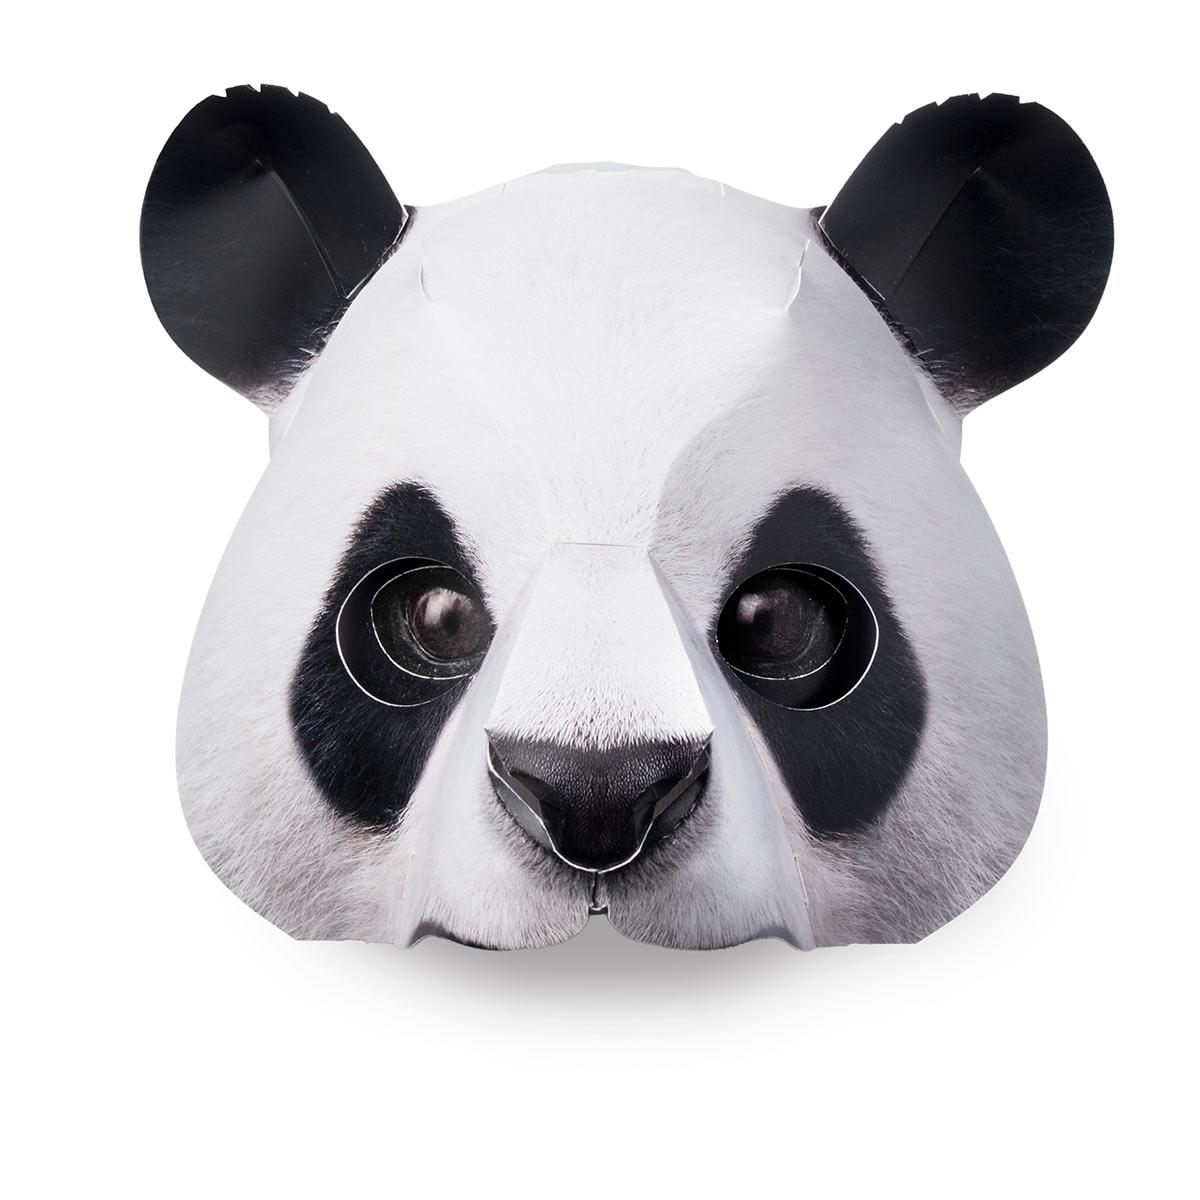 Mask-Panda-01-Product-FRONT.jpg